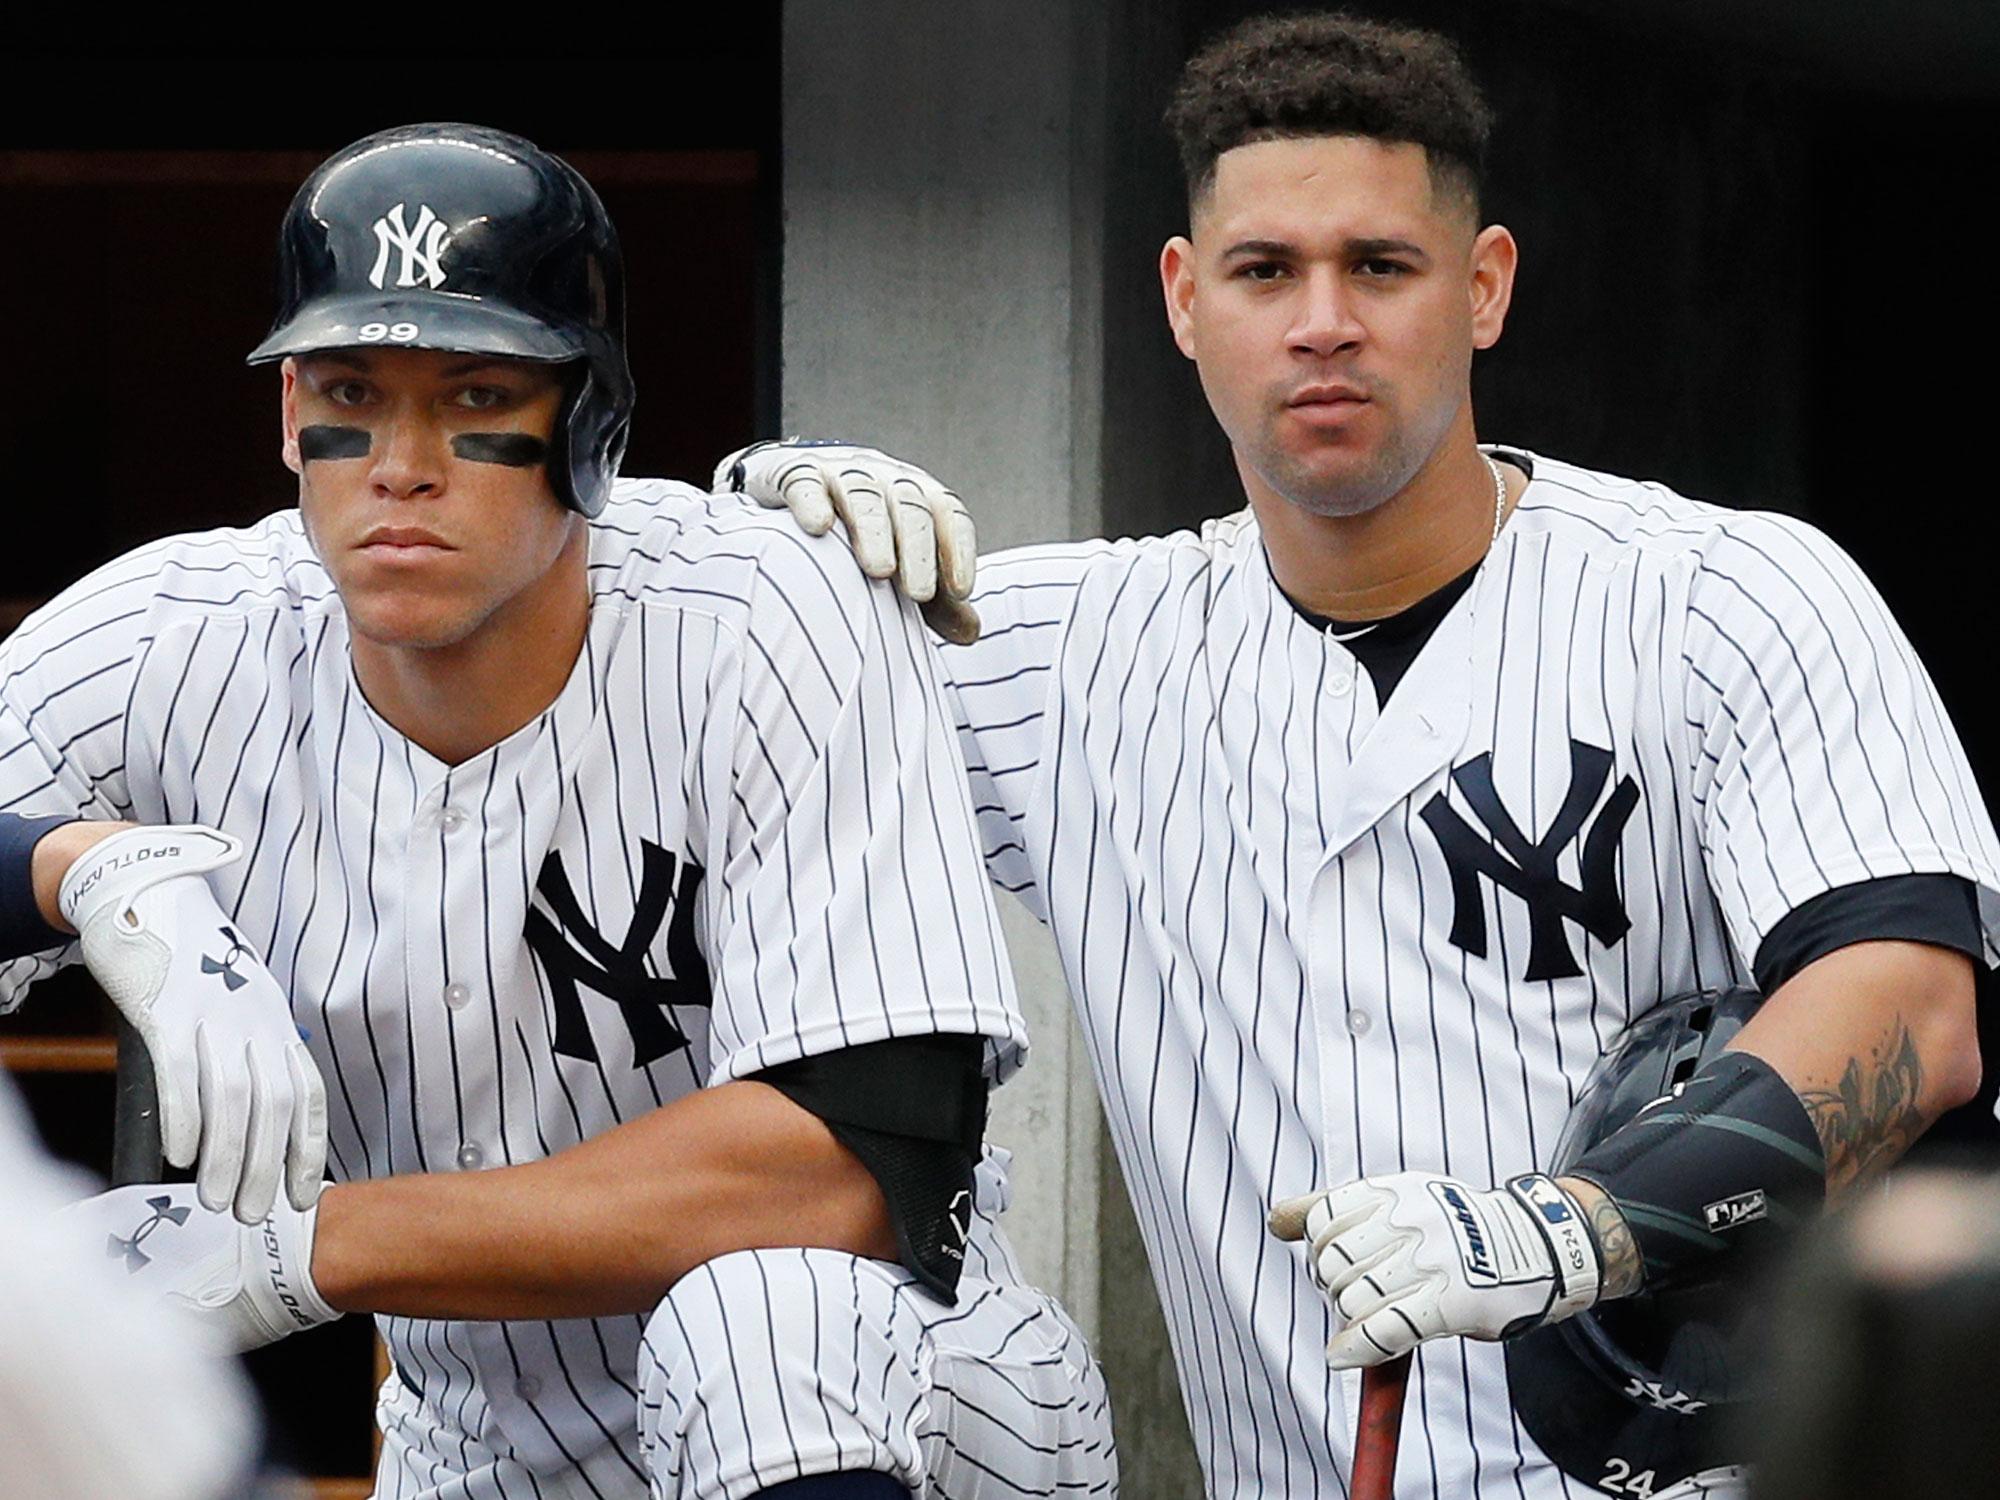 Aaron Judge and Gary Sanchez, New York Yankees